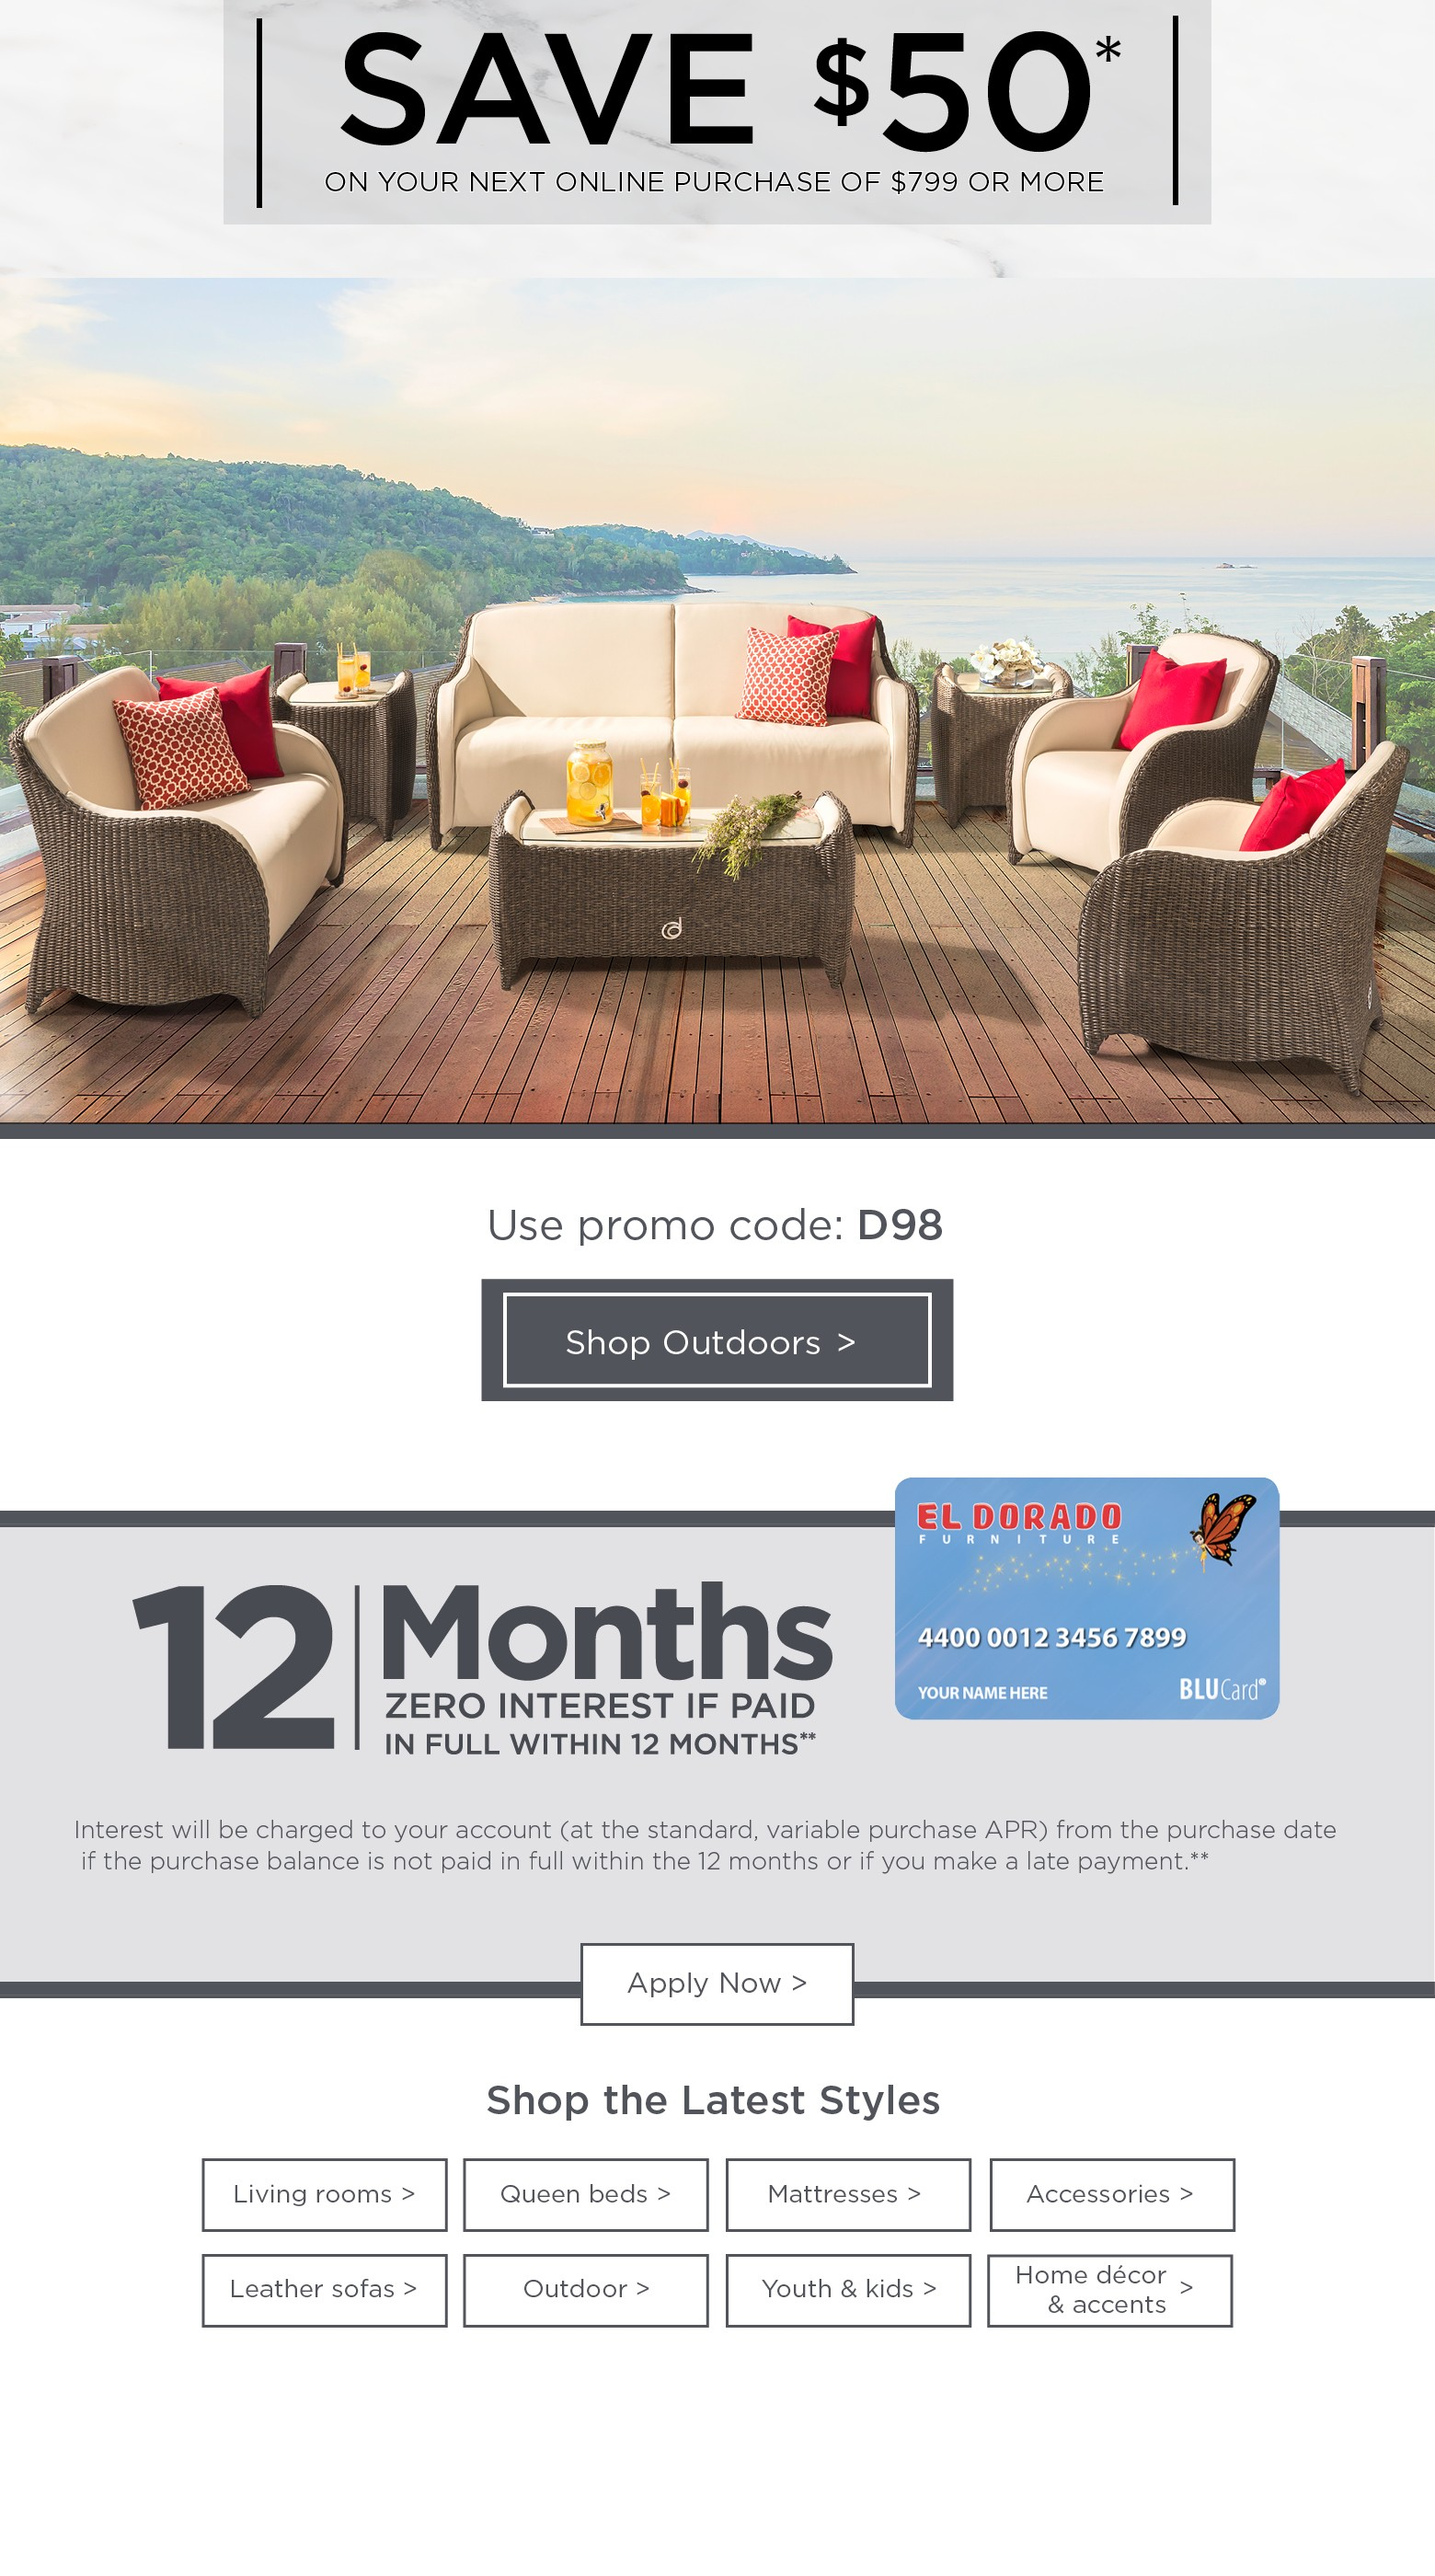 El Dorado Furniture Credit Card Cardjdi Org